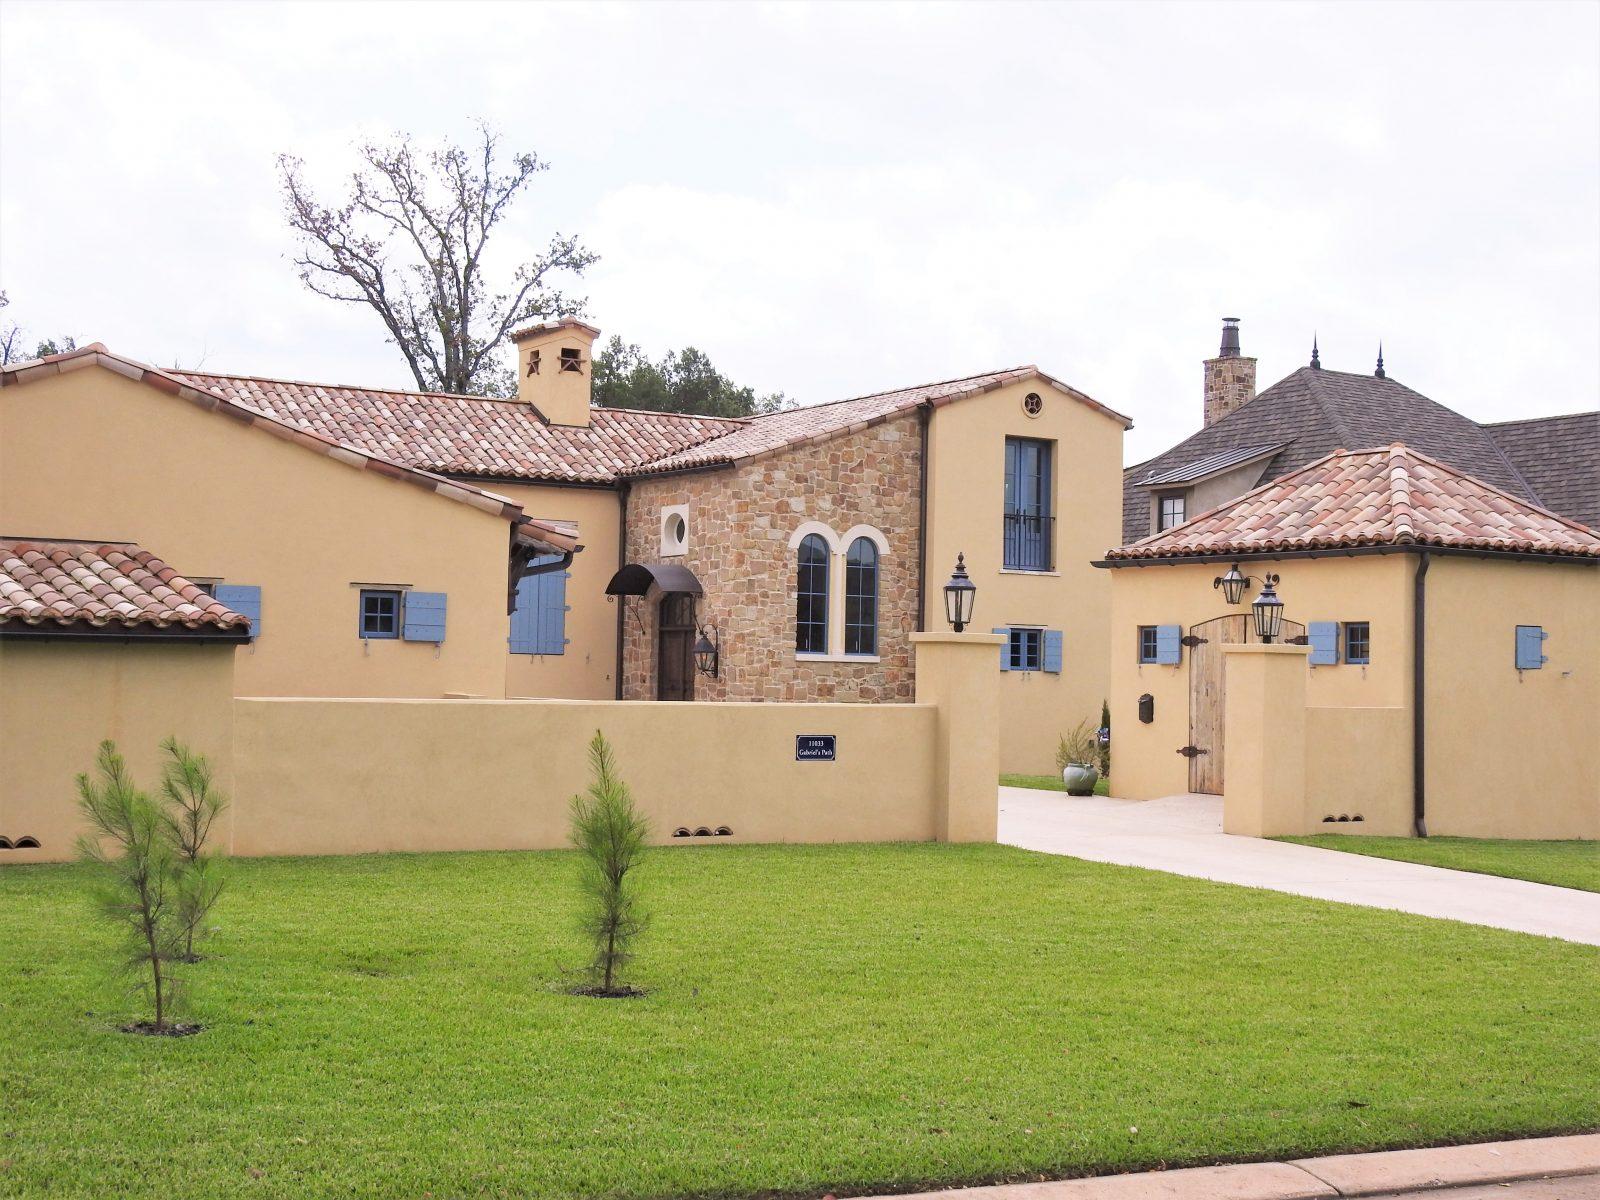 shreveport new home build southwestern style stucco and stone